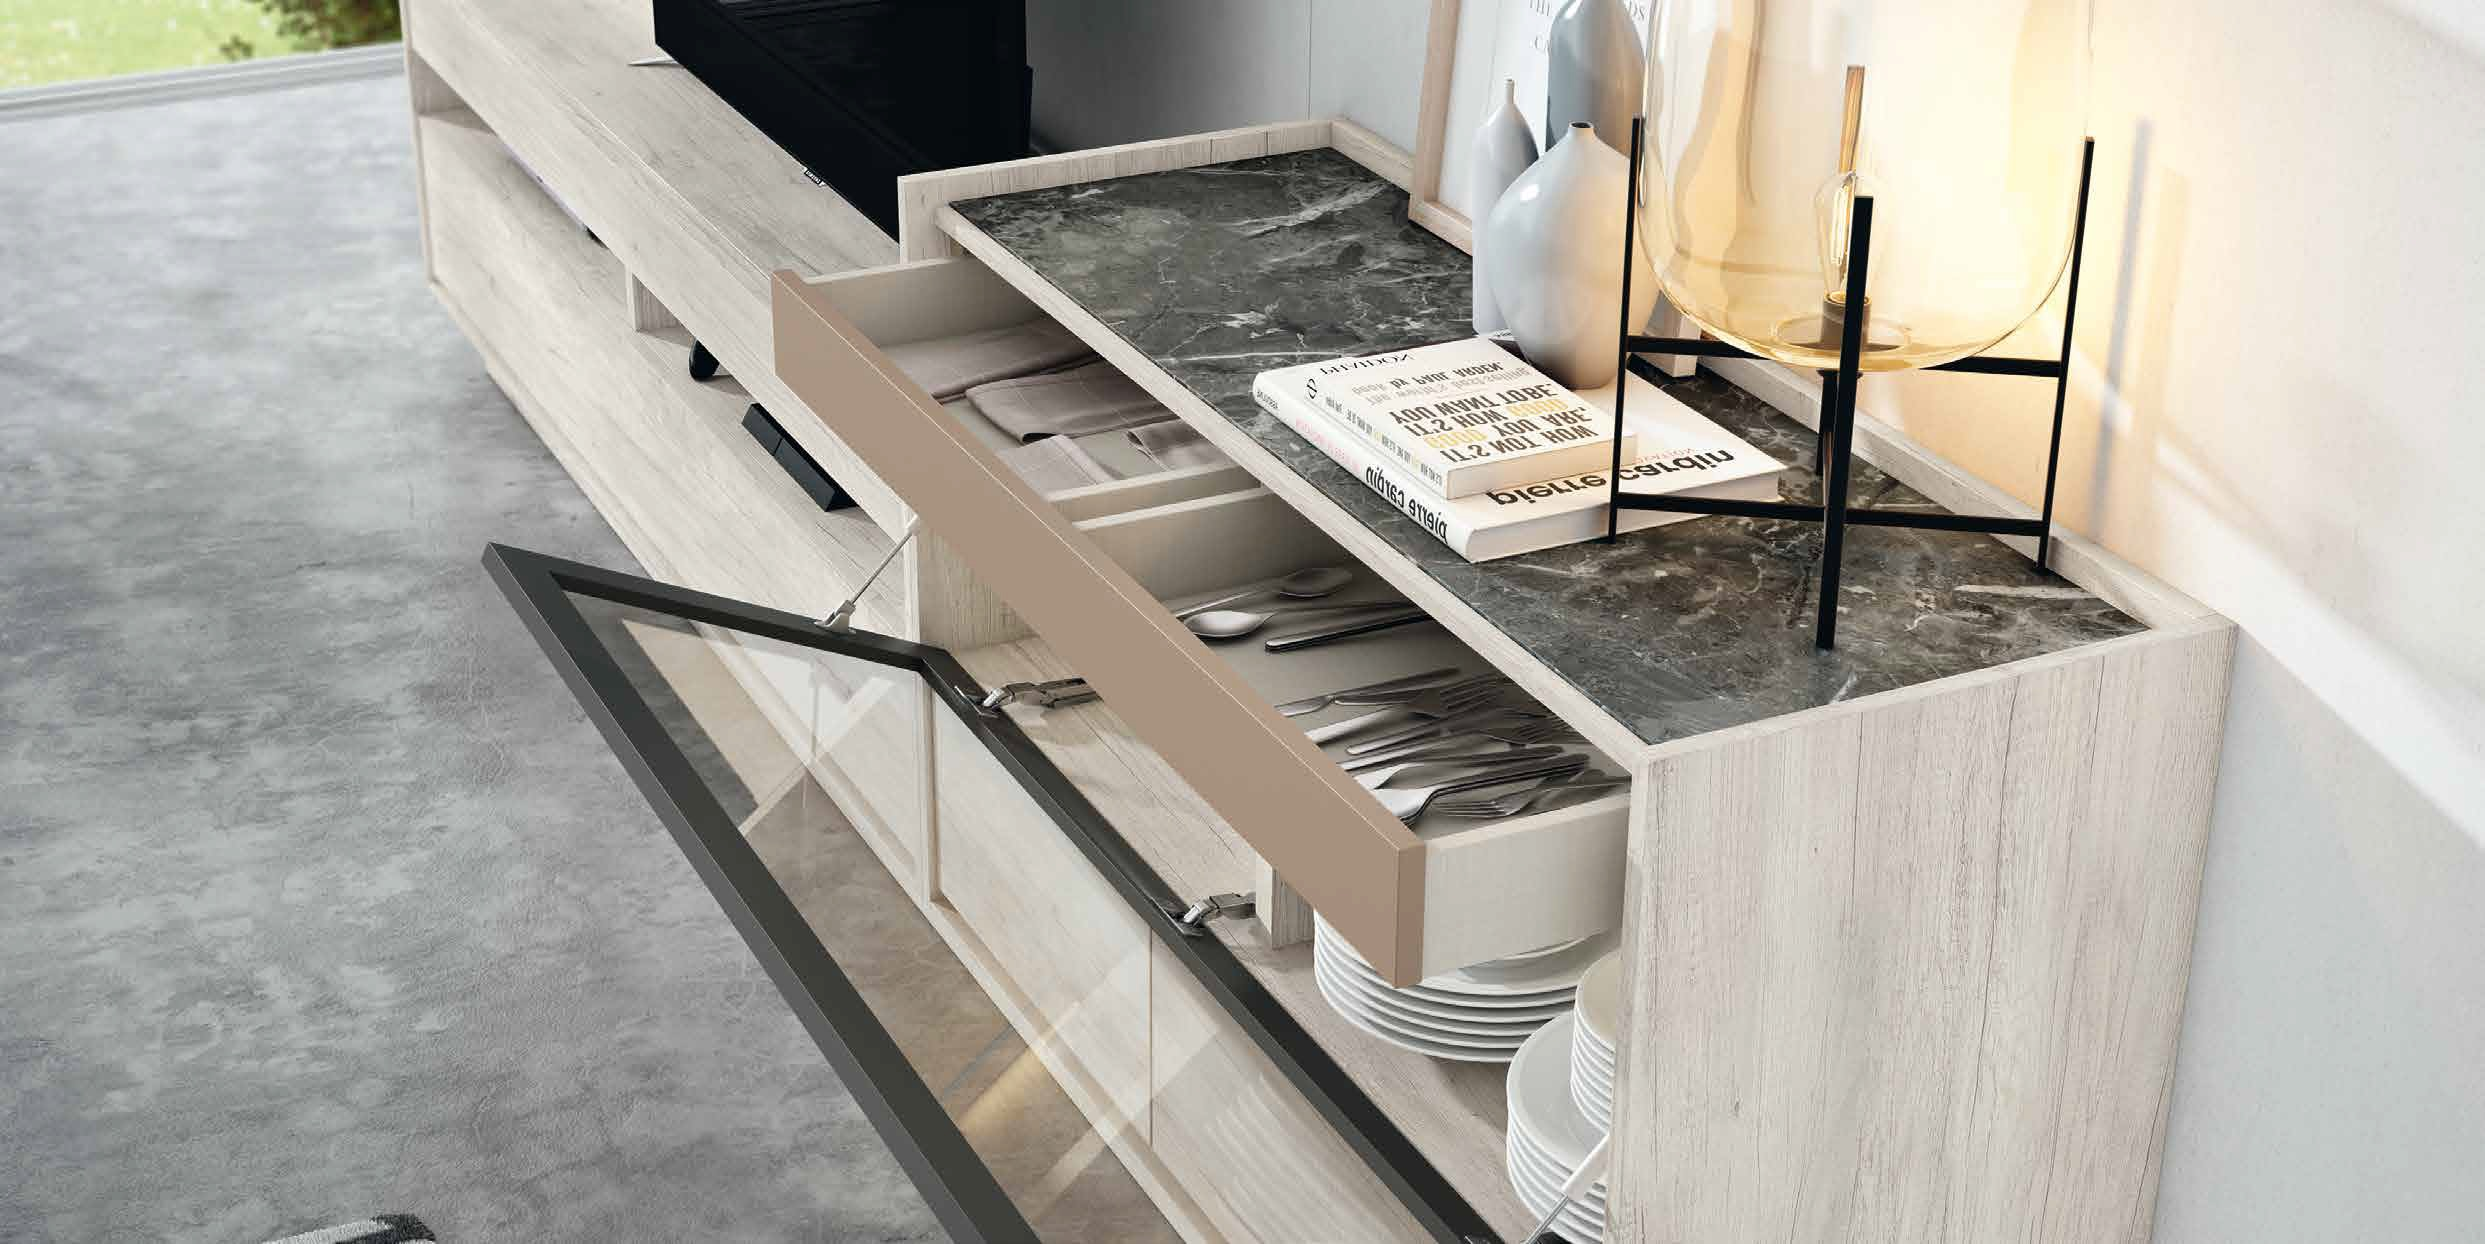 salon-moderno-Nativ-2019-muebles-paco-caballero-0920-5c8cea9b84ad0